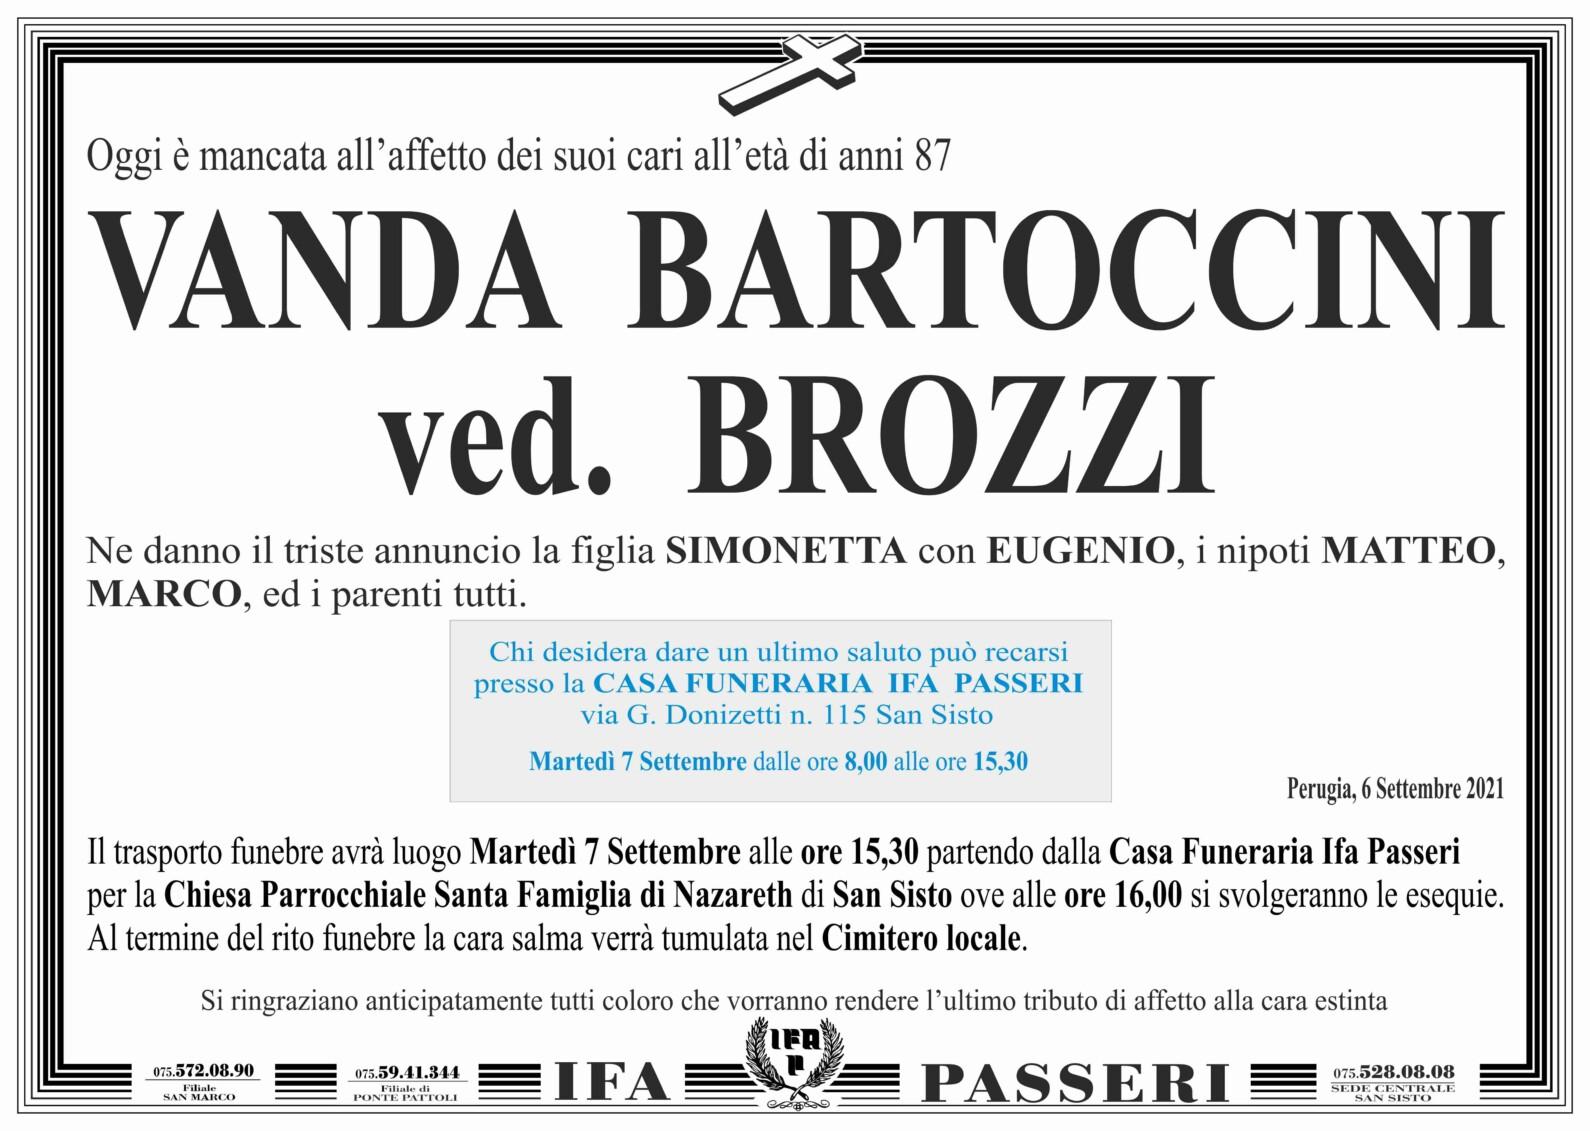 Vanda Bartoccini ved. Brozzi